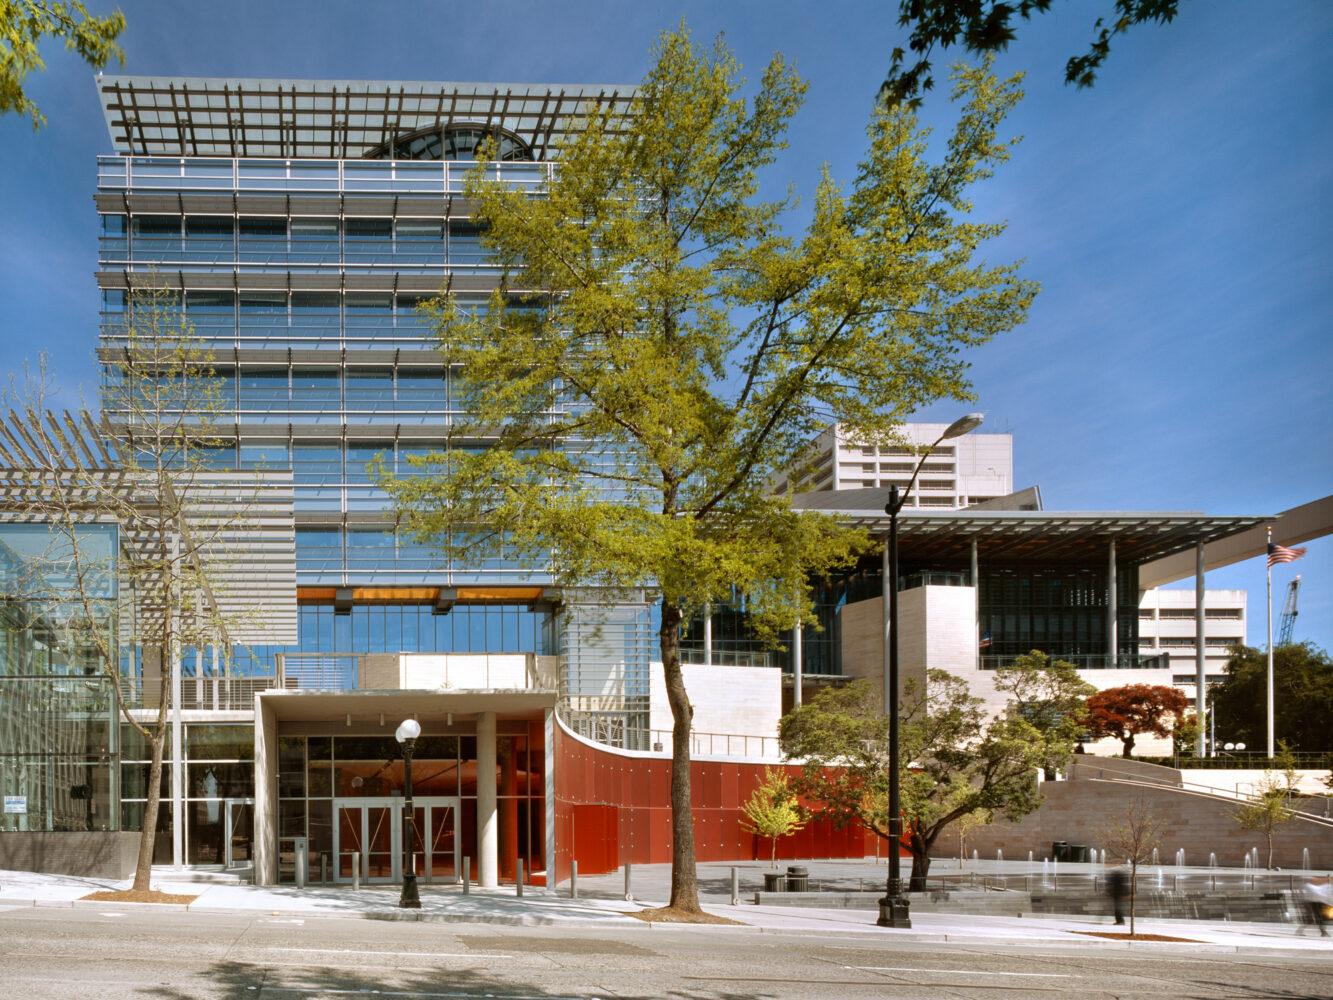 Seattle Civic Center